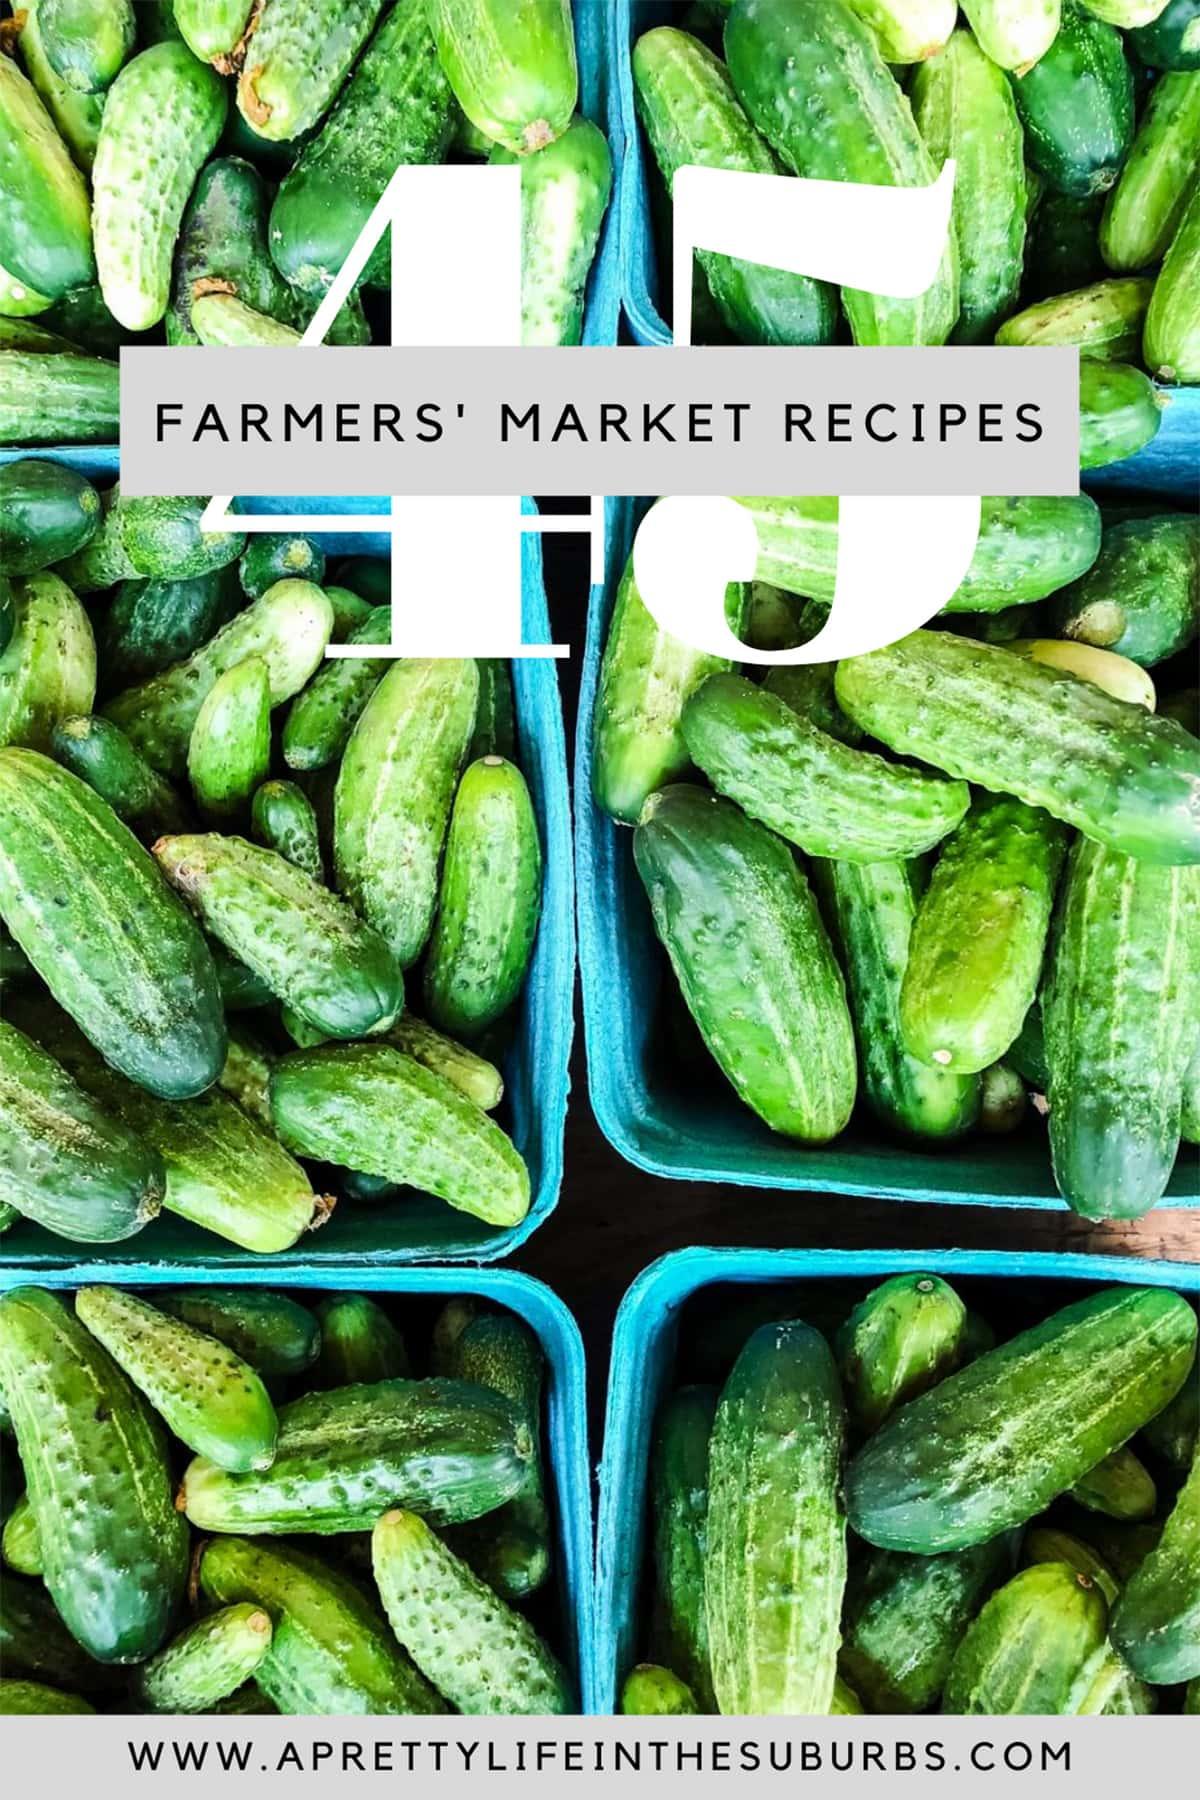 45+ Farmers' Market Recipe Ideas